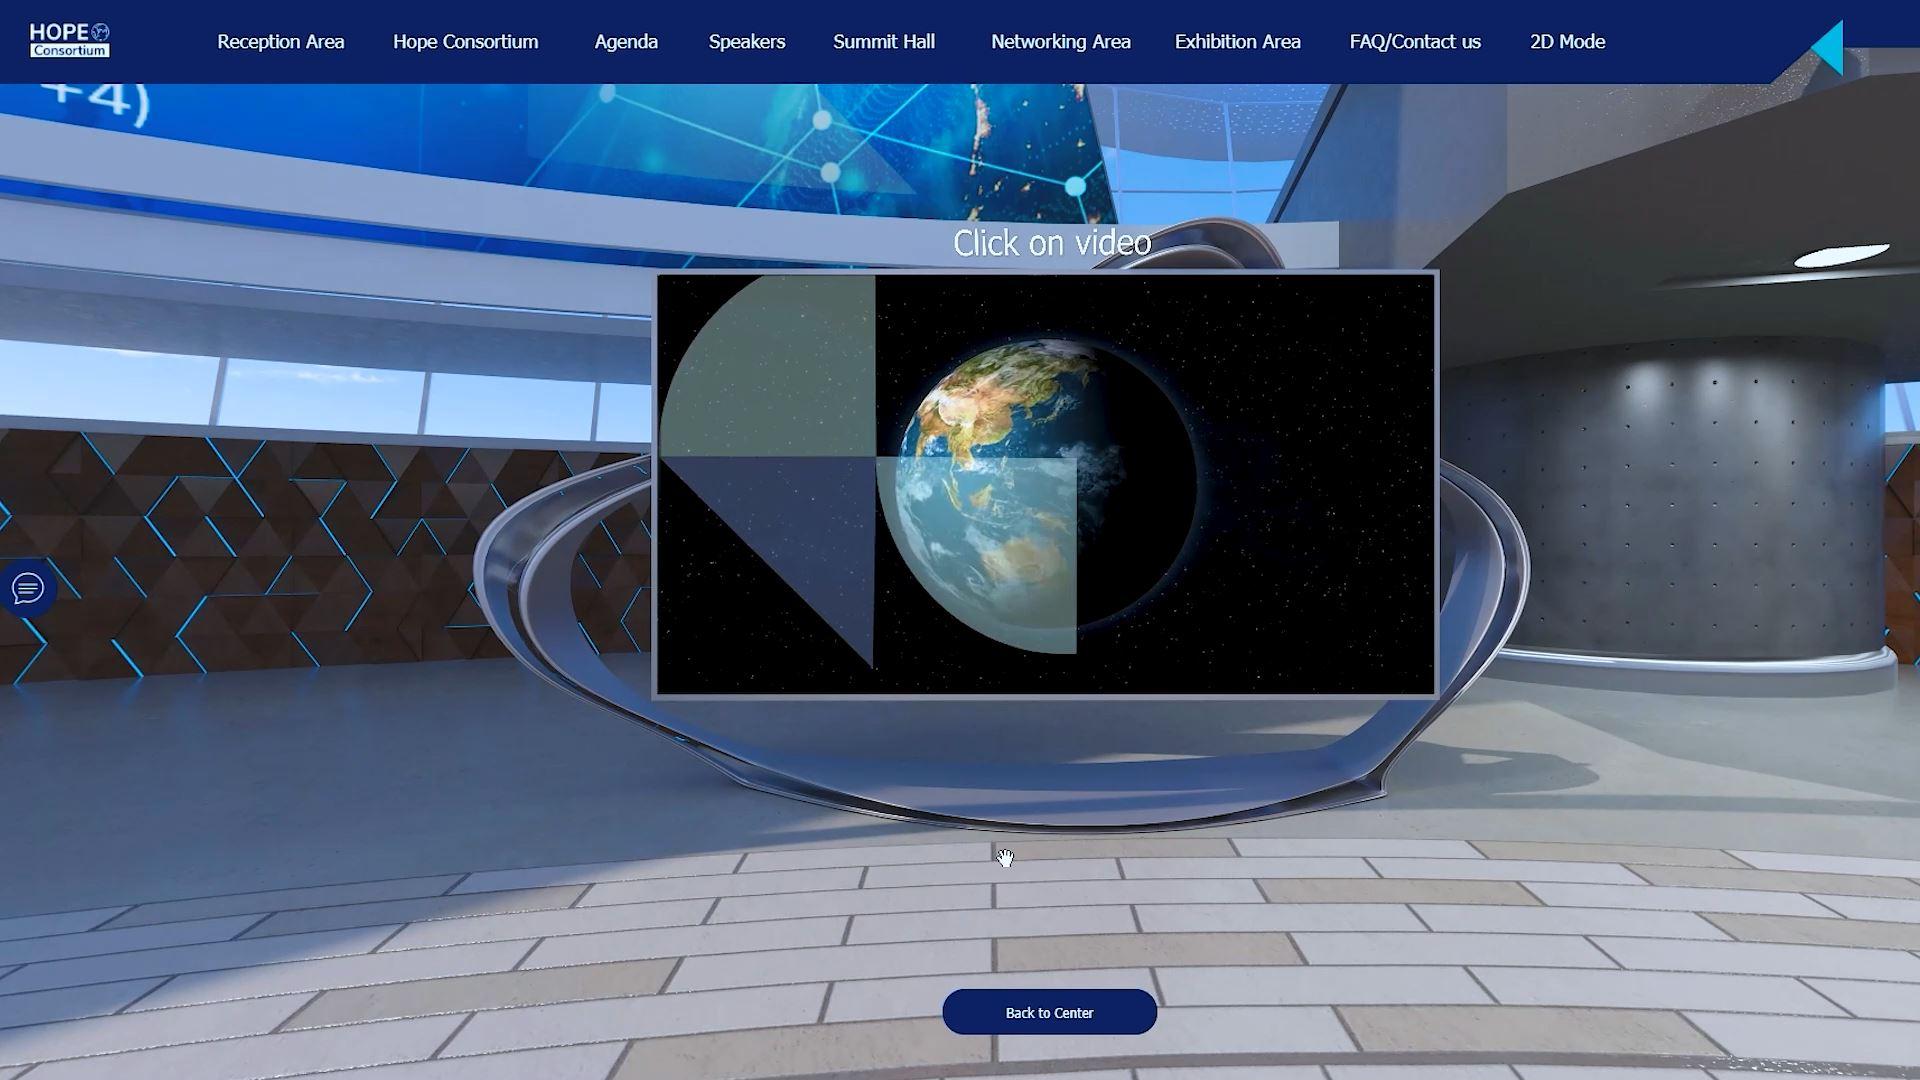 hope consortium world immunization and logistics summit virtual exhibition video screen